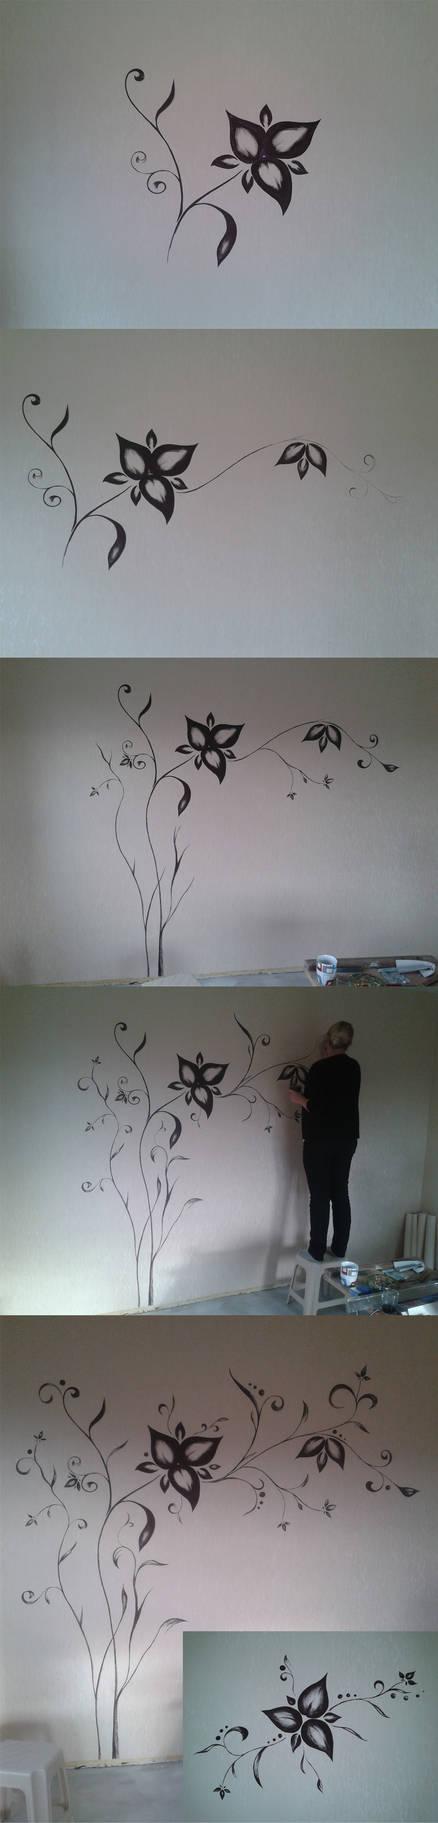 Wall Tattoo step by step